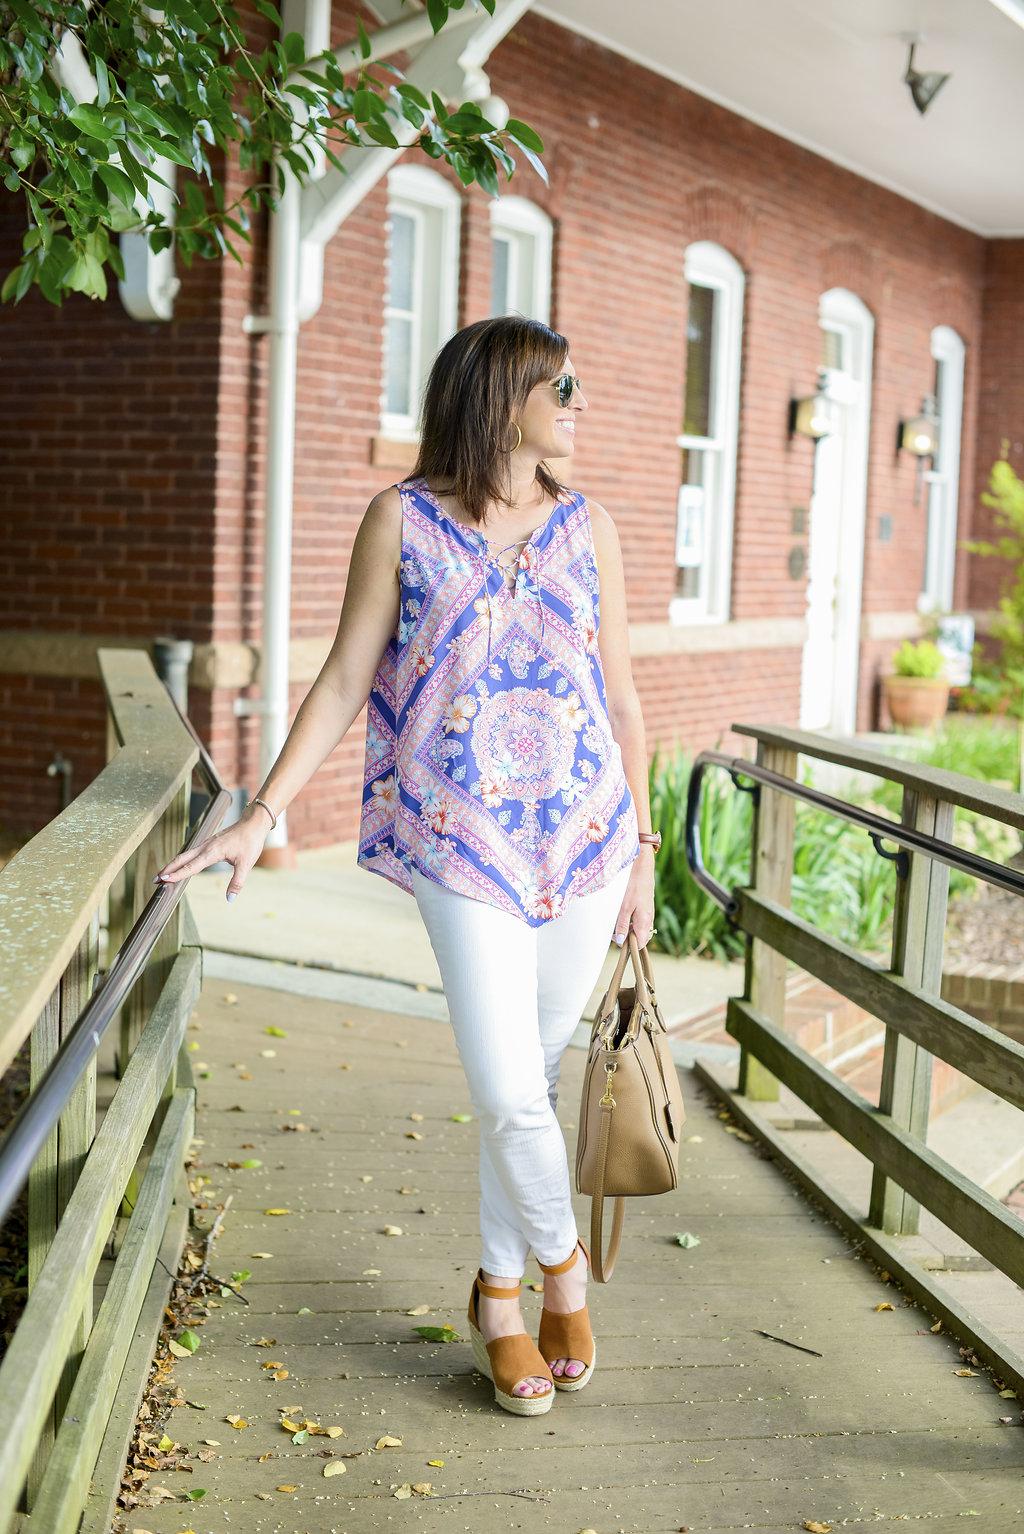 J. Jill Scarf Print Top + White Jeans - @mbg0112 - I'm Fixin' To